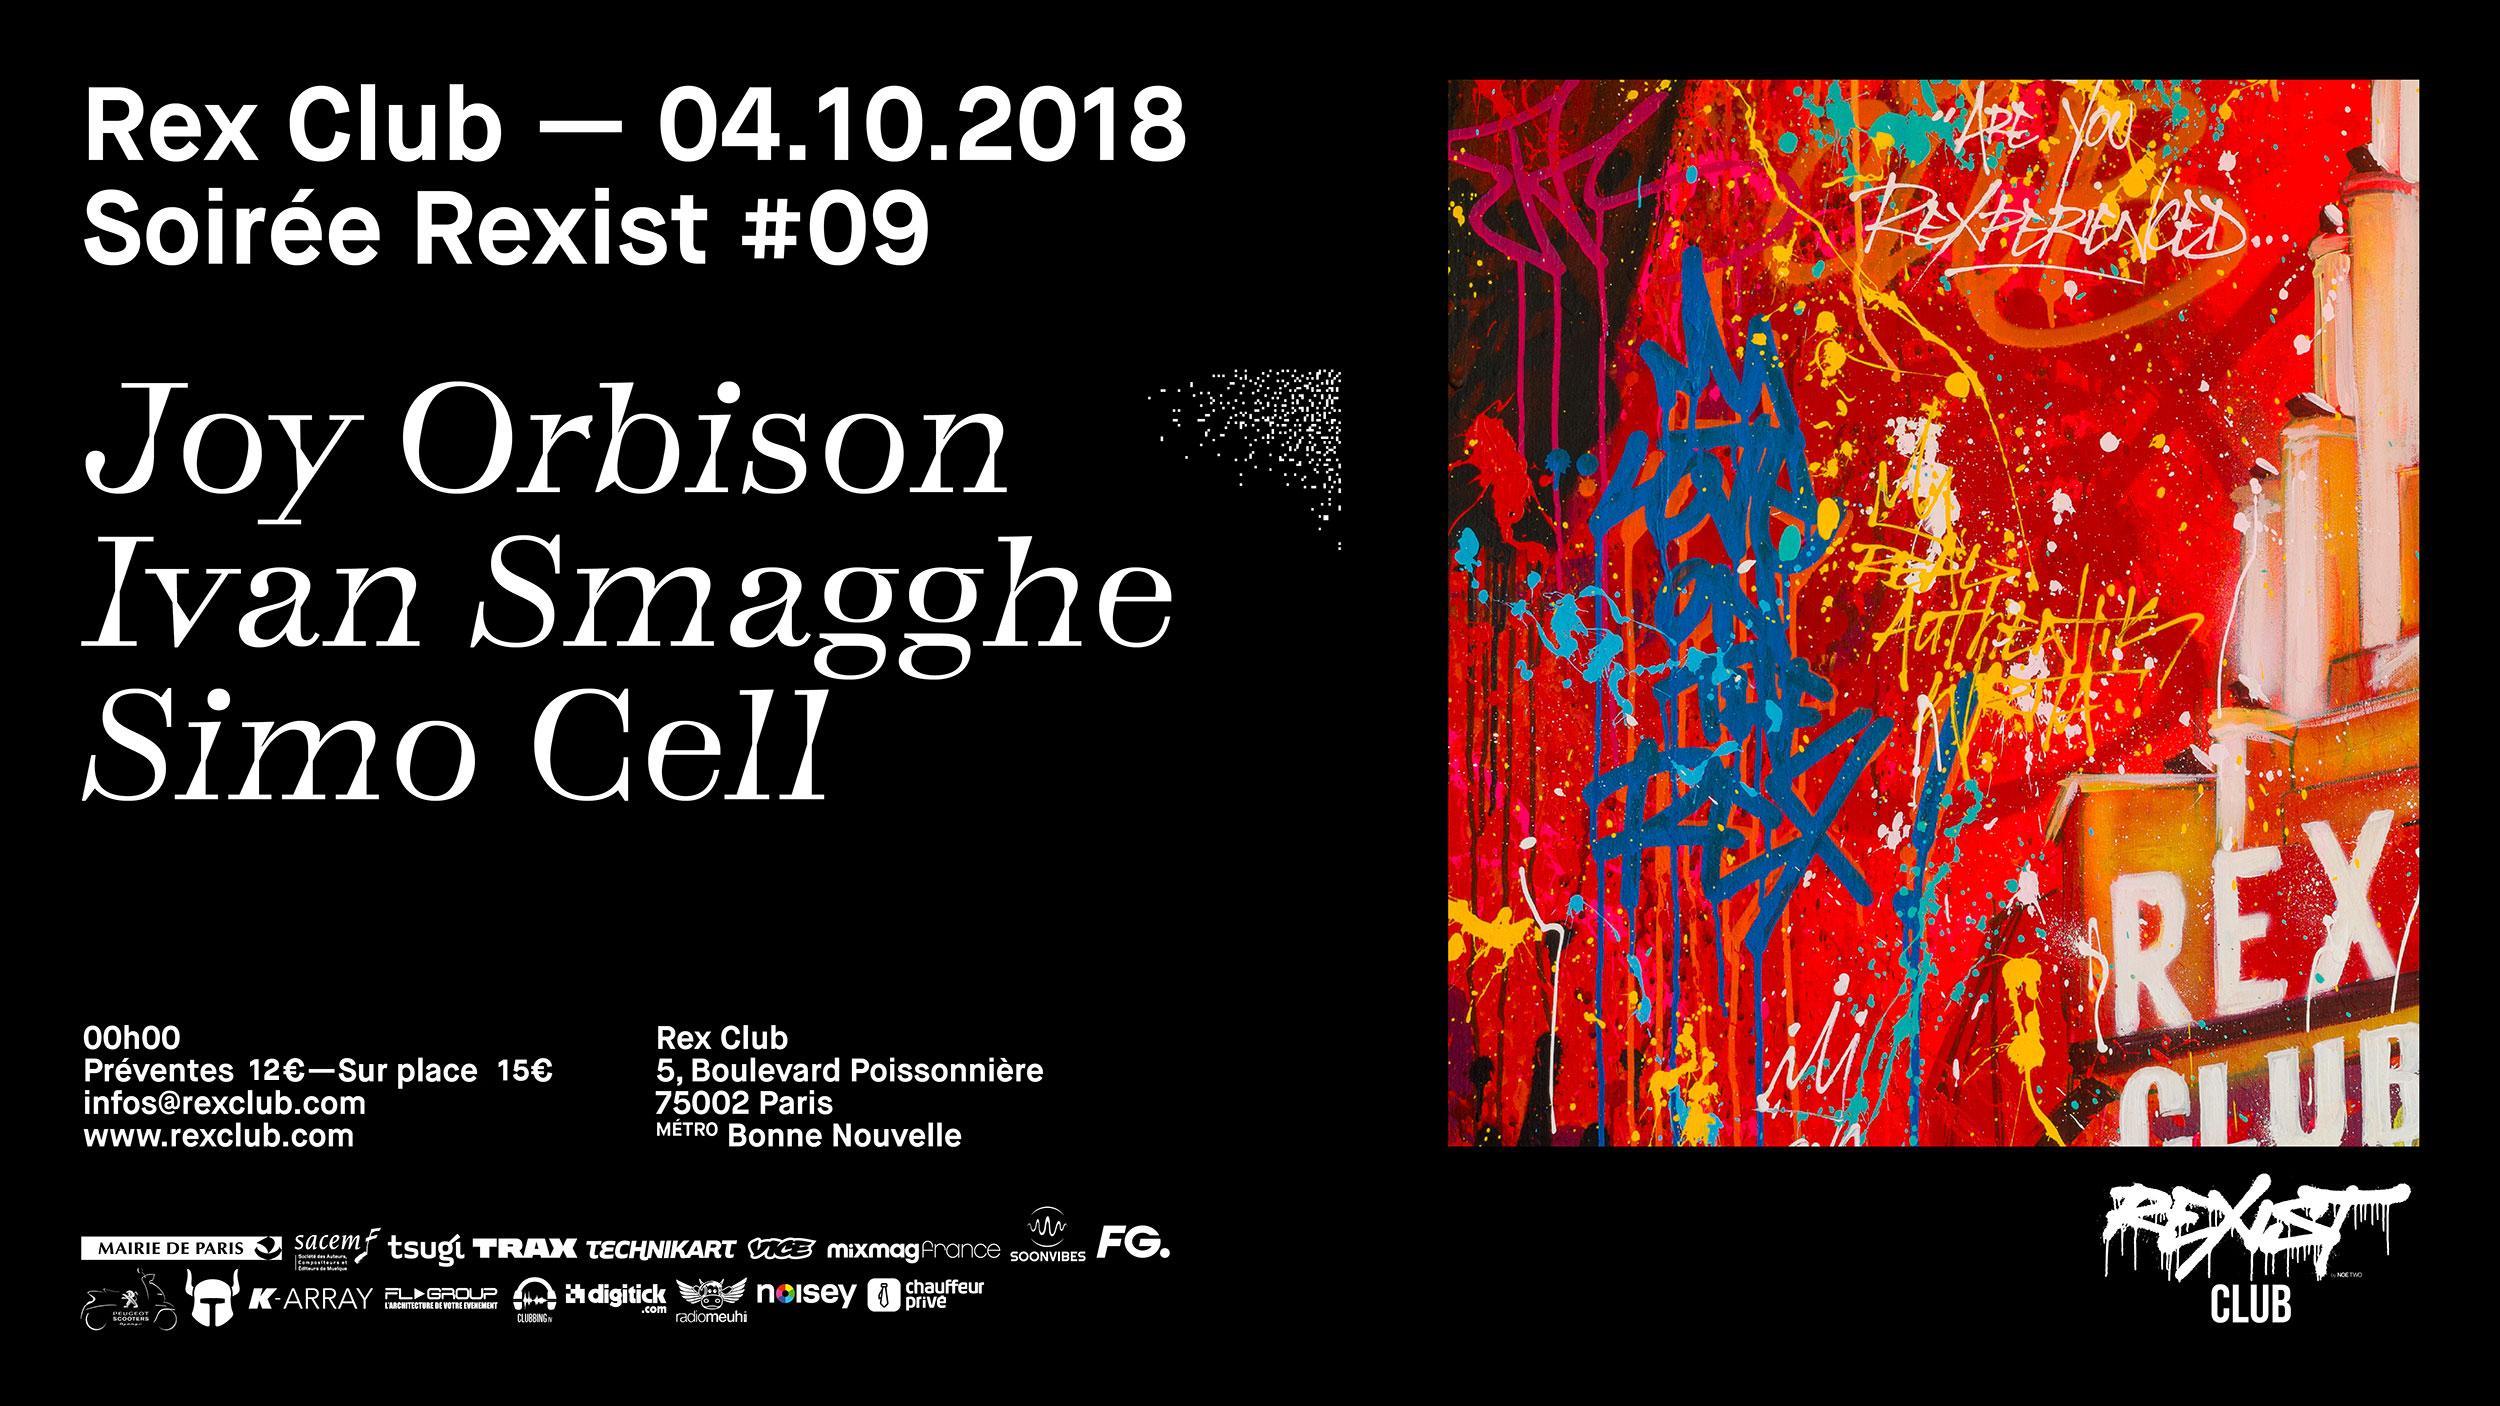 Rexist 9: Joy Orbison, Ivan Smagghe, Simo Cell